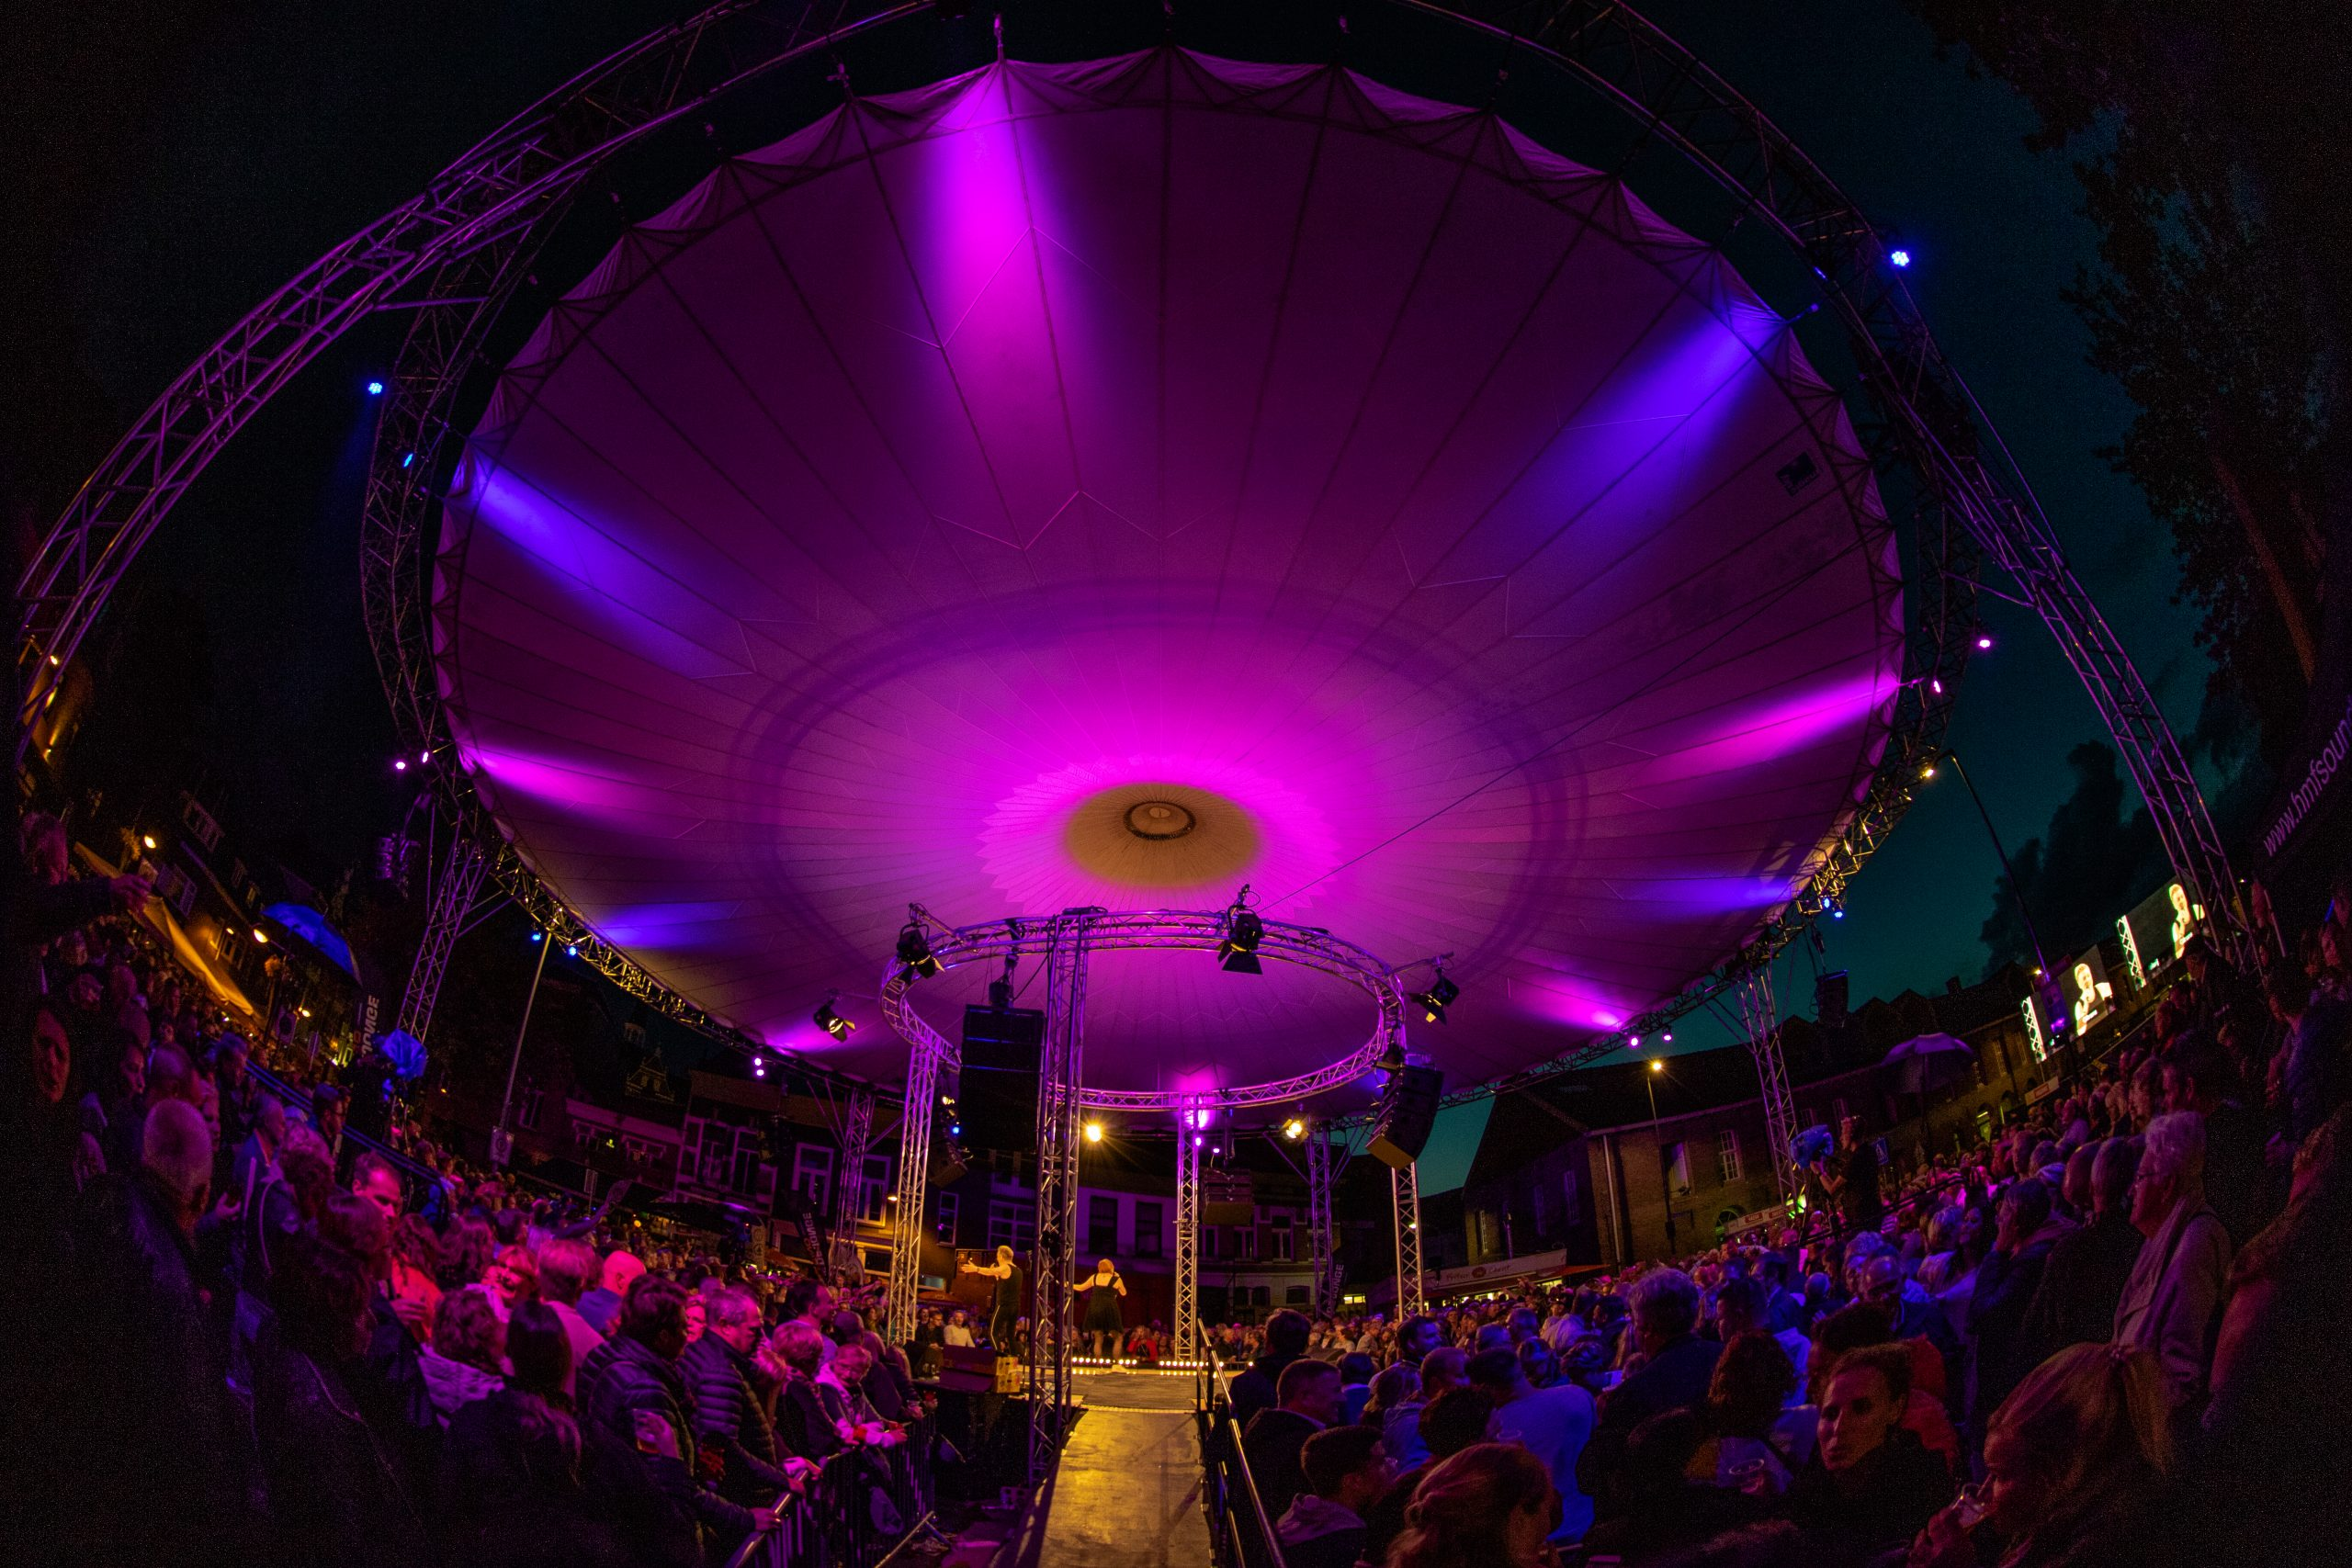 projecten hmf tranen van cooth festival